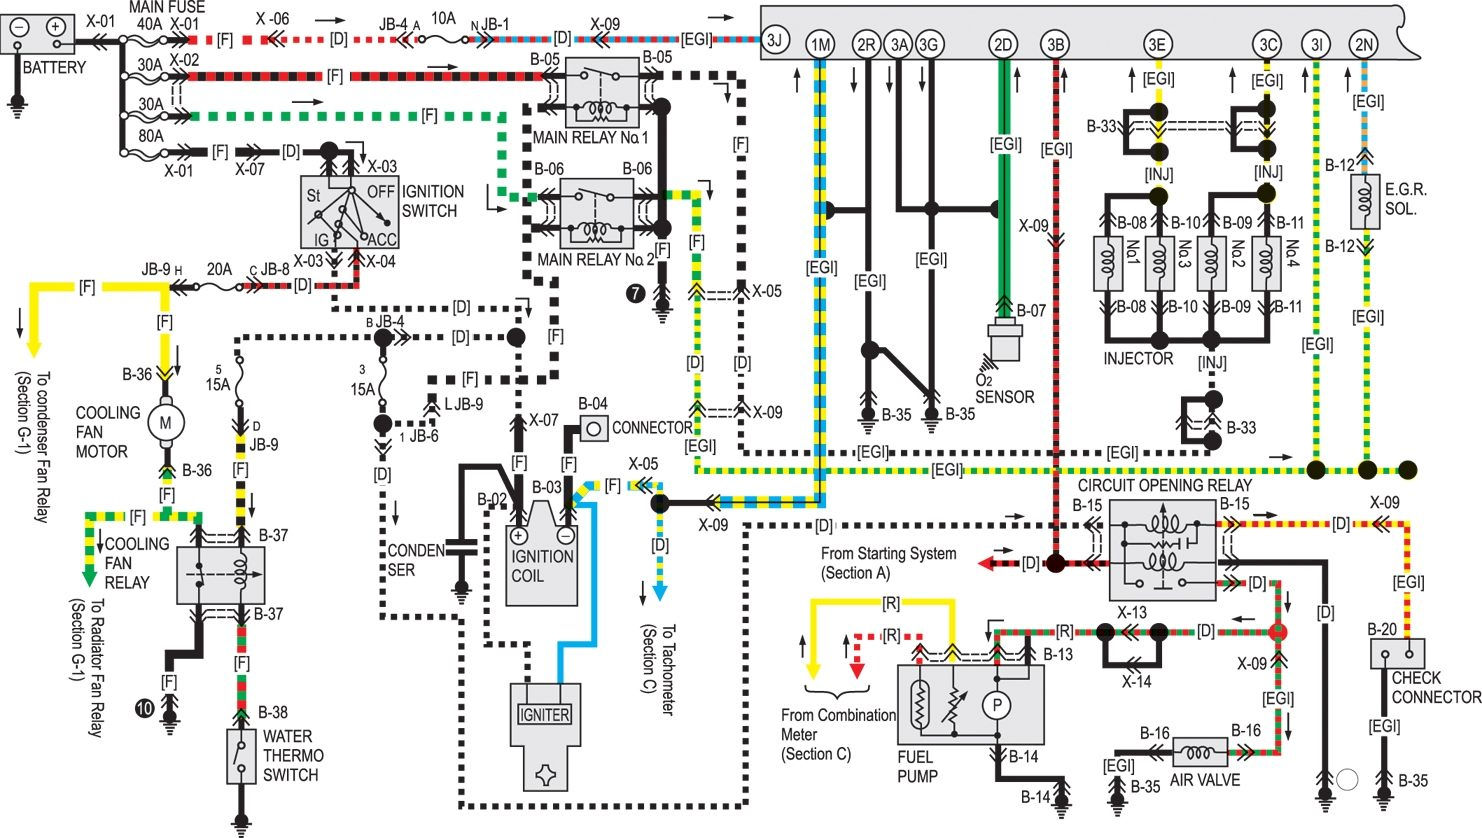 1999 Mazda Protege Fuse Box Wiring Library 626 Gd Diagram Circuit Symbols U2022 2002